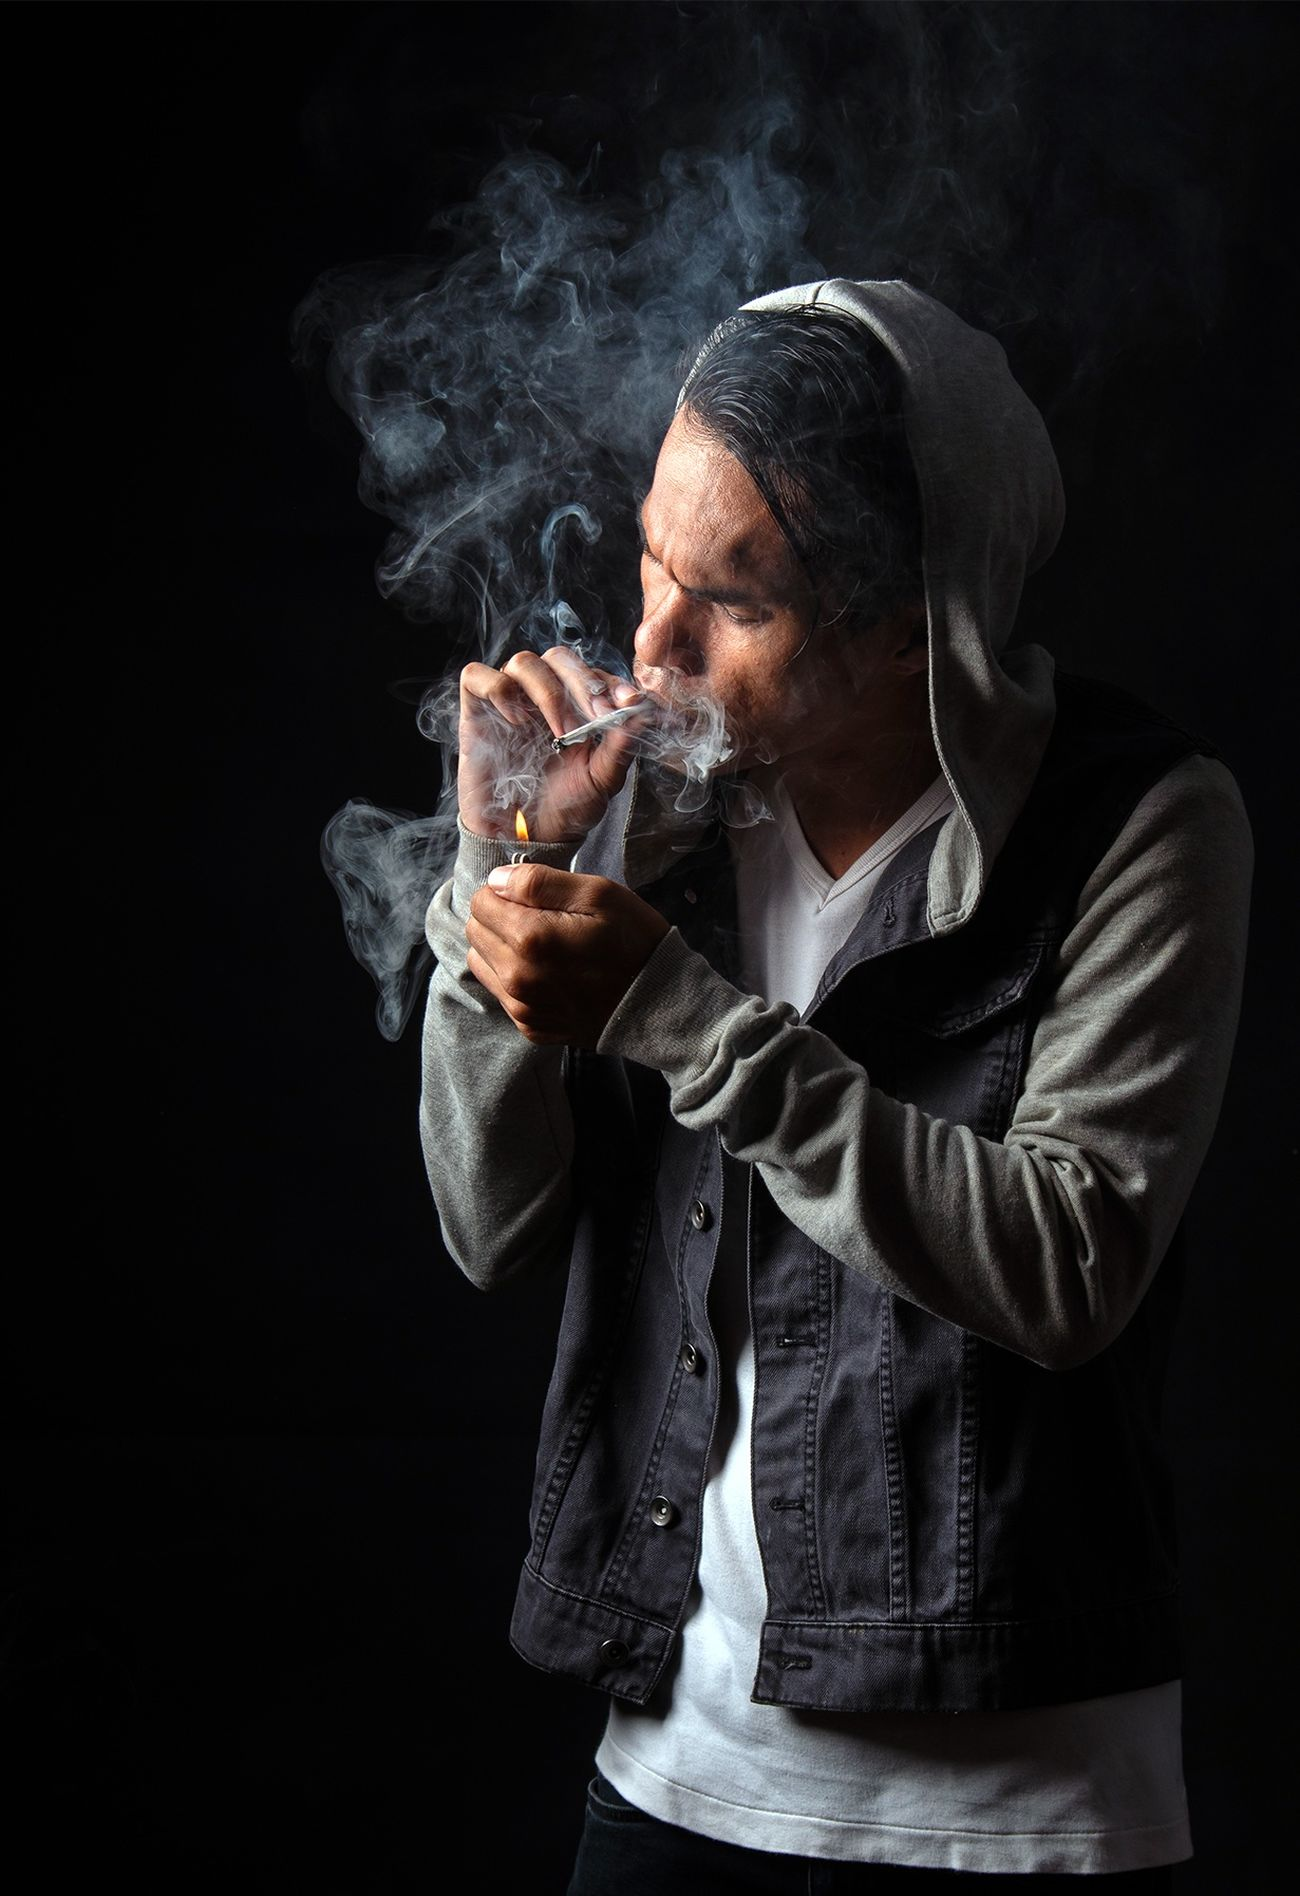 Taking Photos Photostudio Smoker Selfie